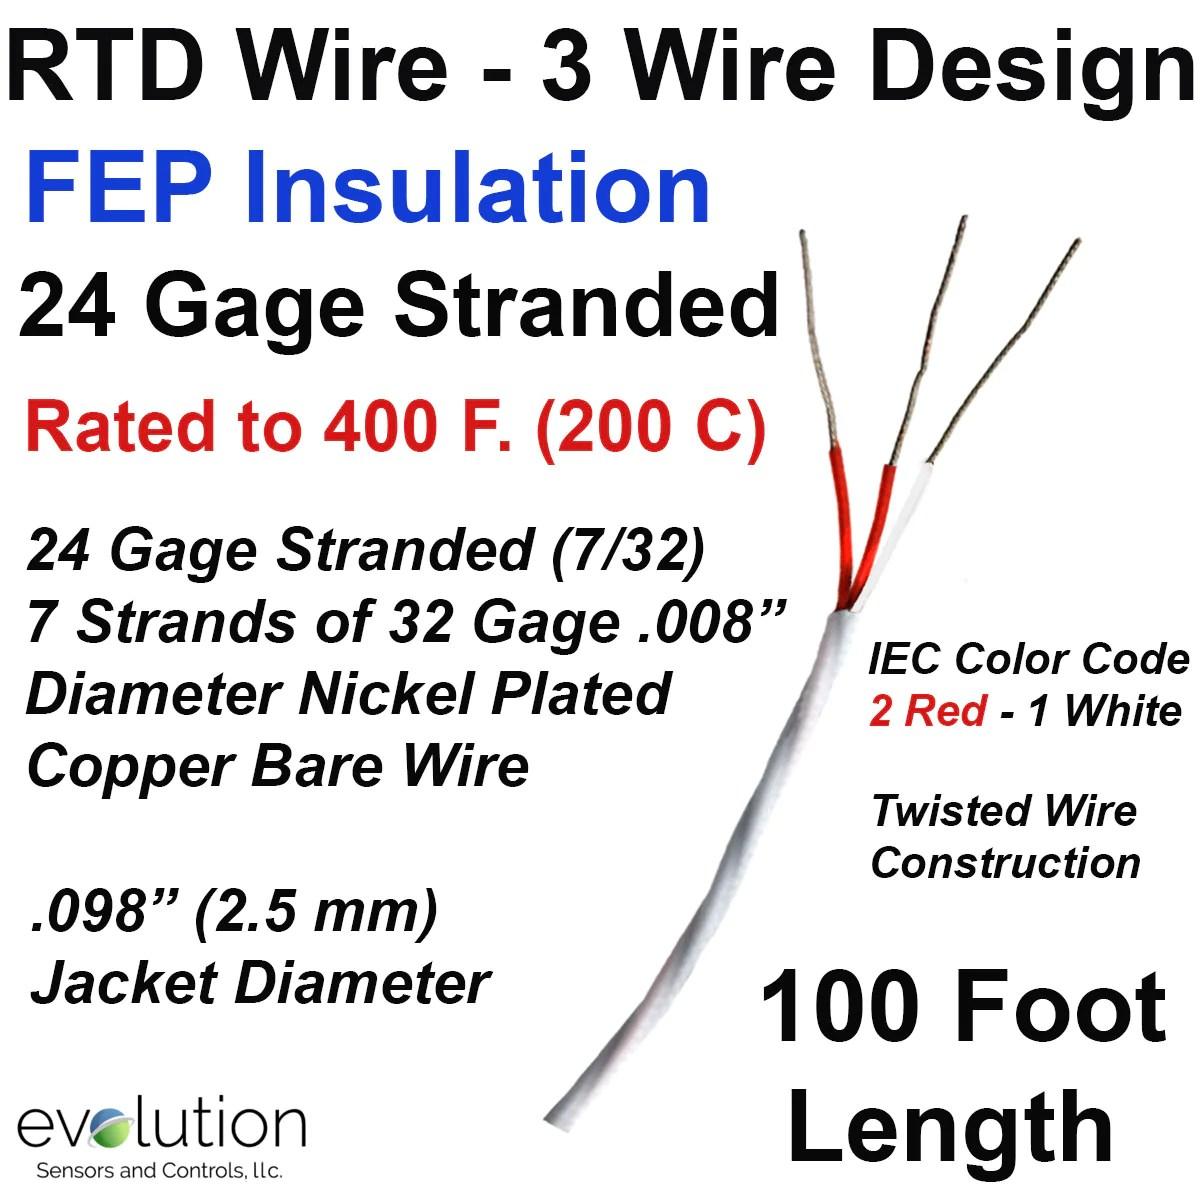 rtd wiring color code wiring diagram inside rtd 3 wire color code rtd wiring color code [ 1200 x 1200 Pixel ]